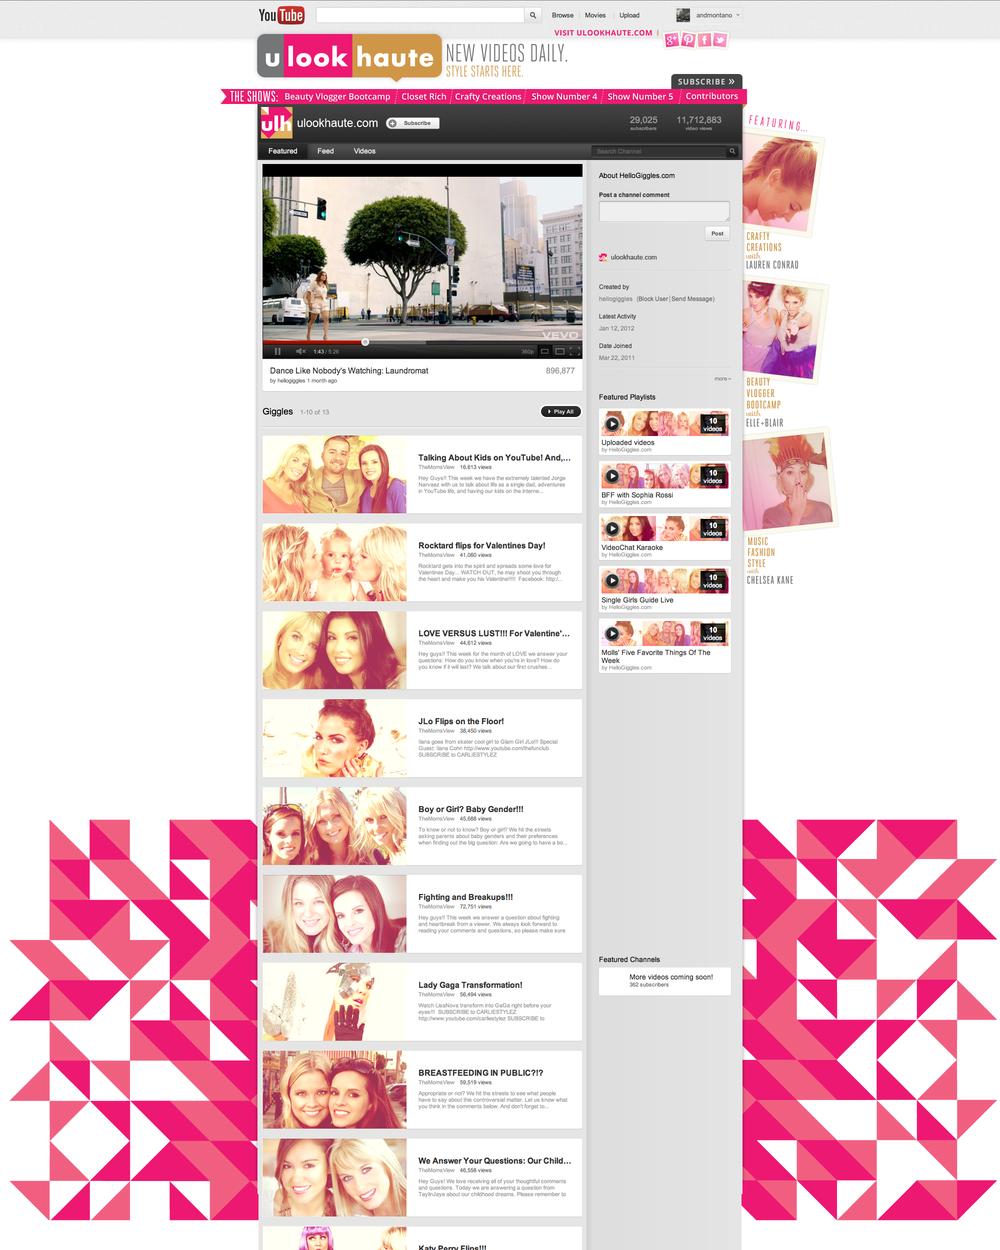 ulh_youtube_0220_v04b_launch.jpg